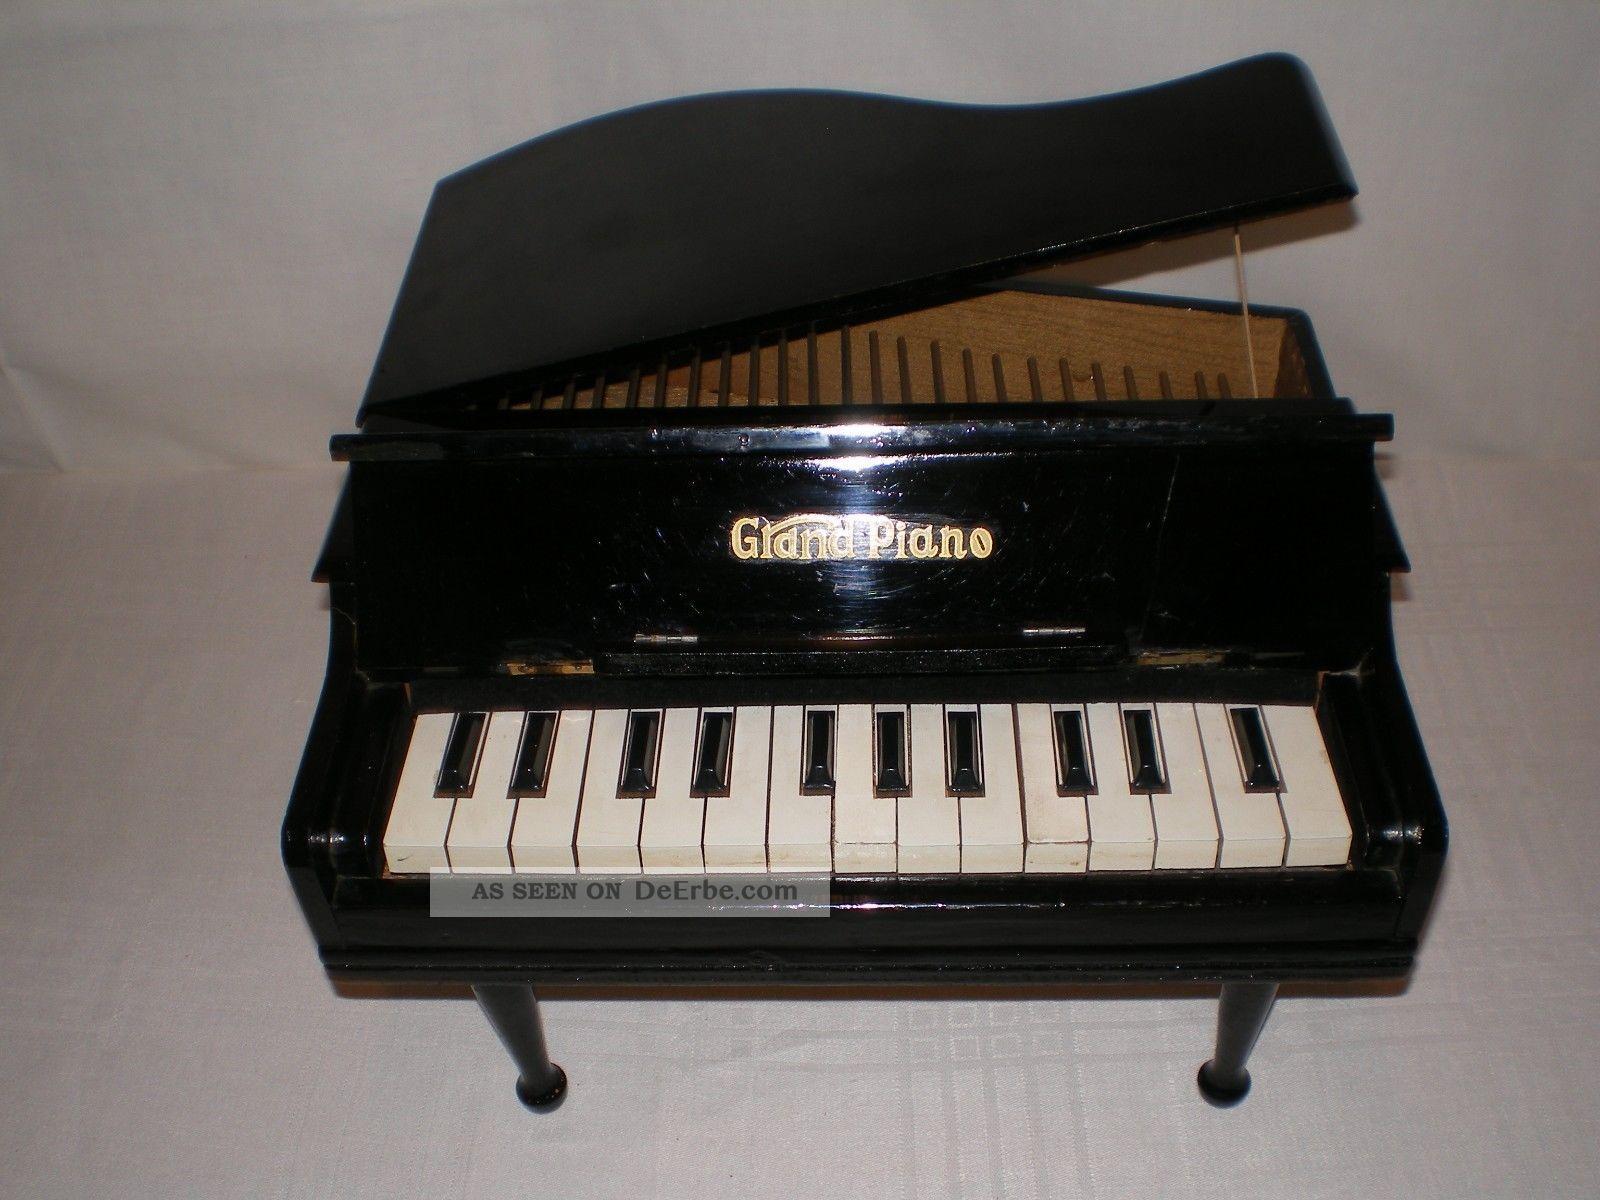 kinder klavier mini grand piano 50 er jahre intakt bespielbar 20 cm hoch. Black Bedroom Furniture Sets. Home Design Ideas